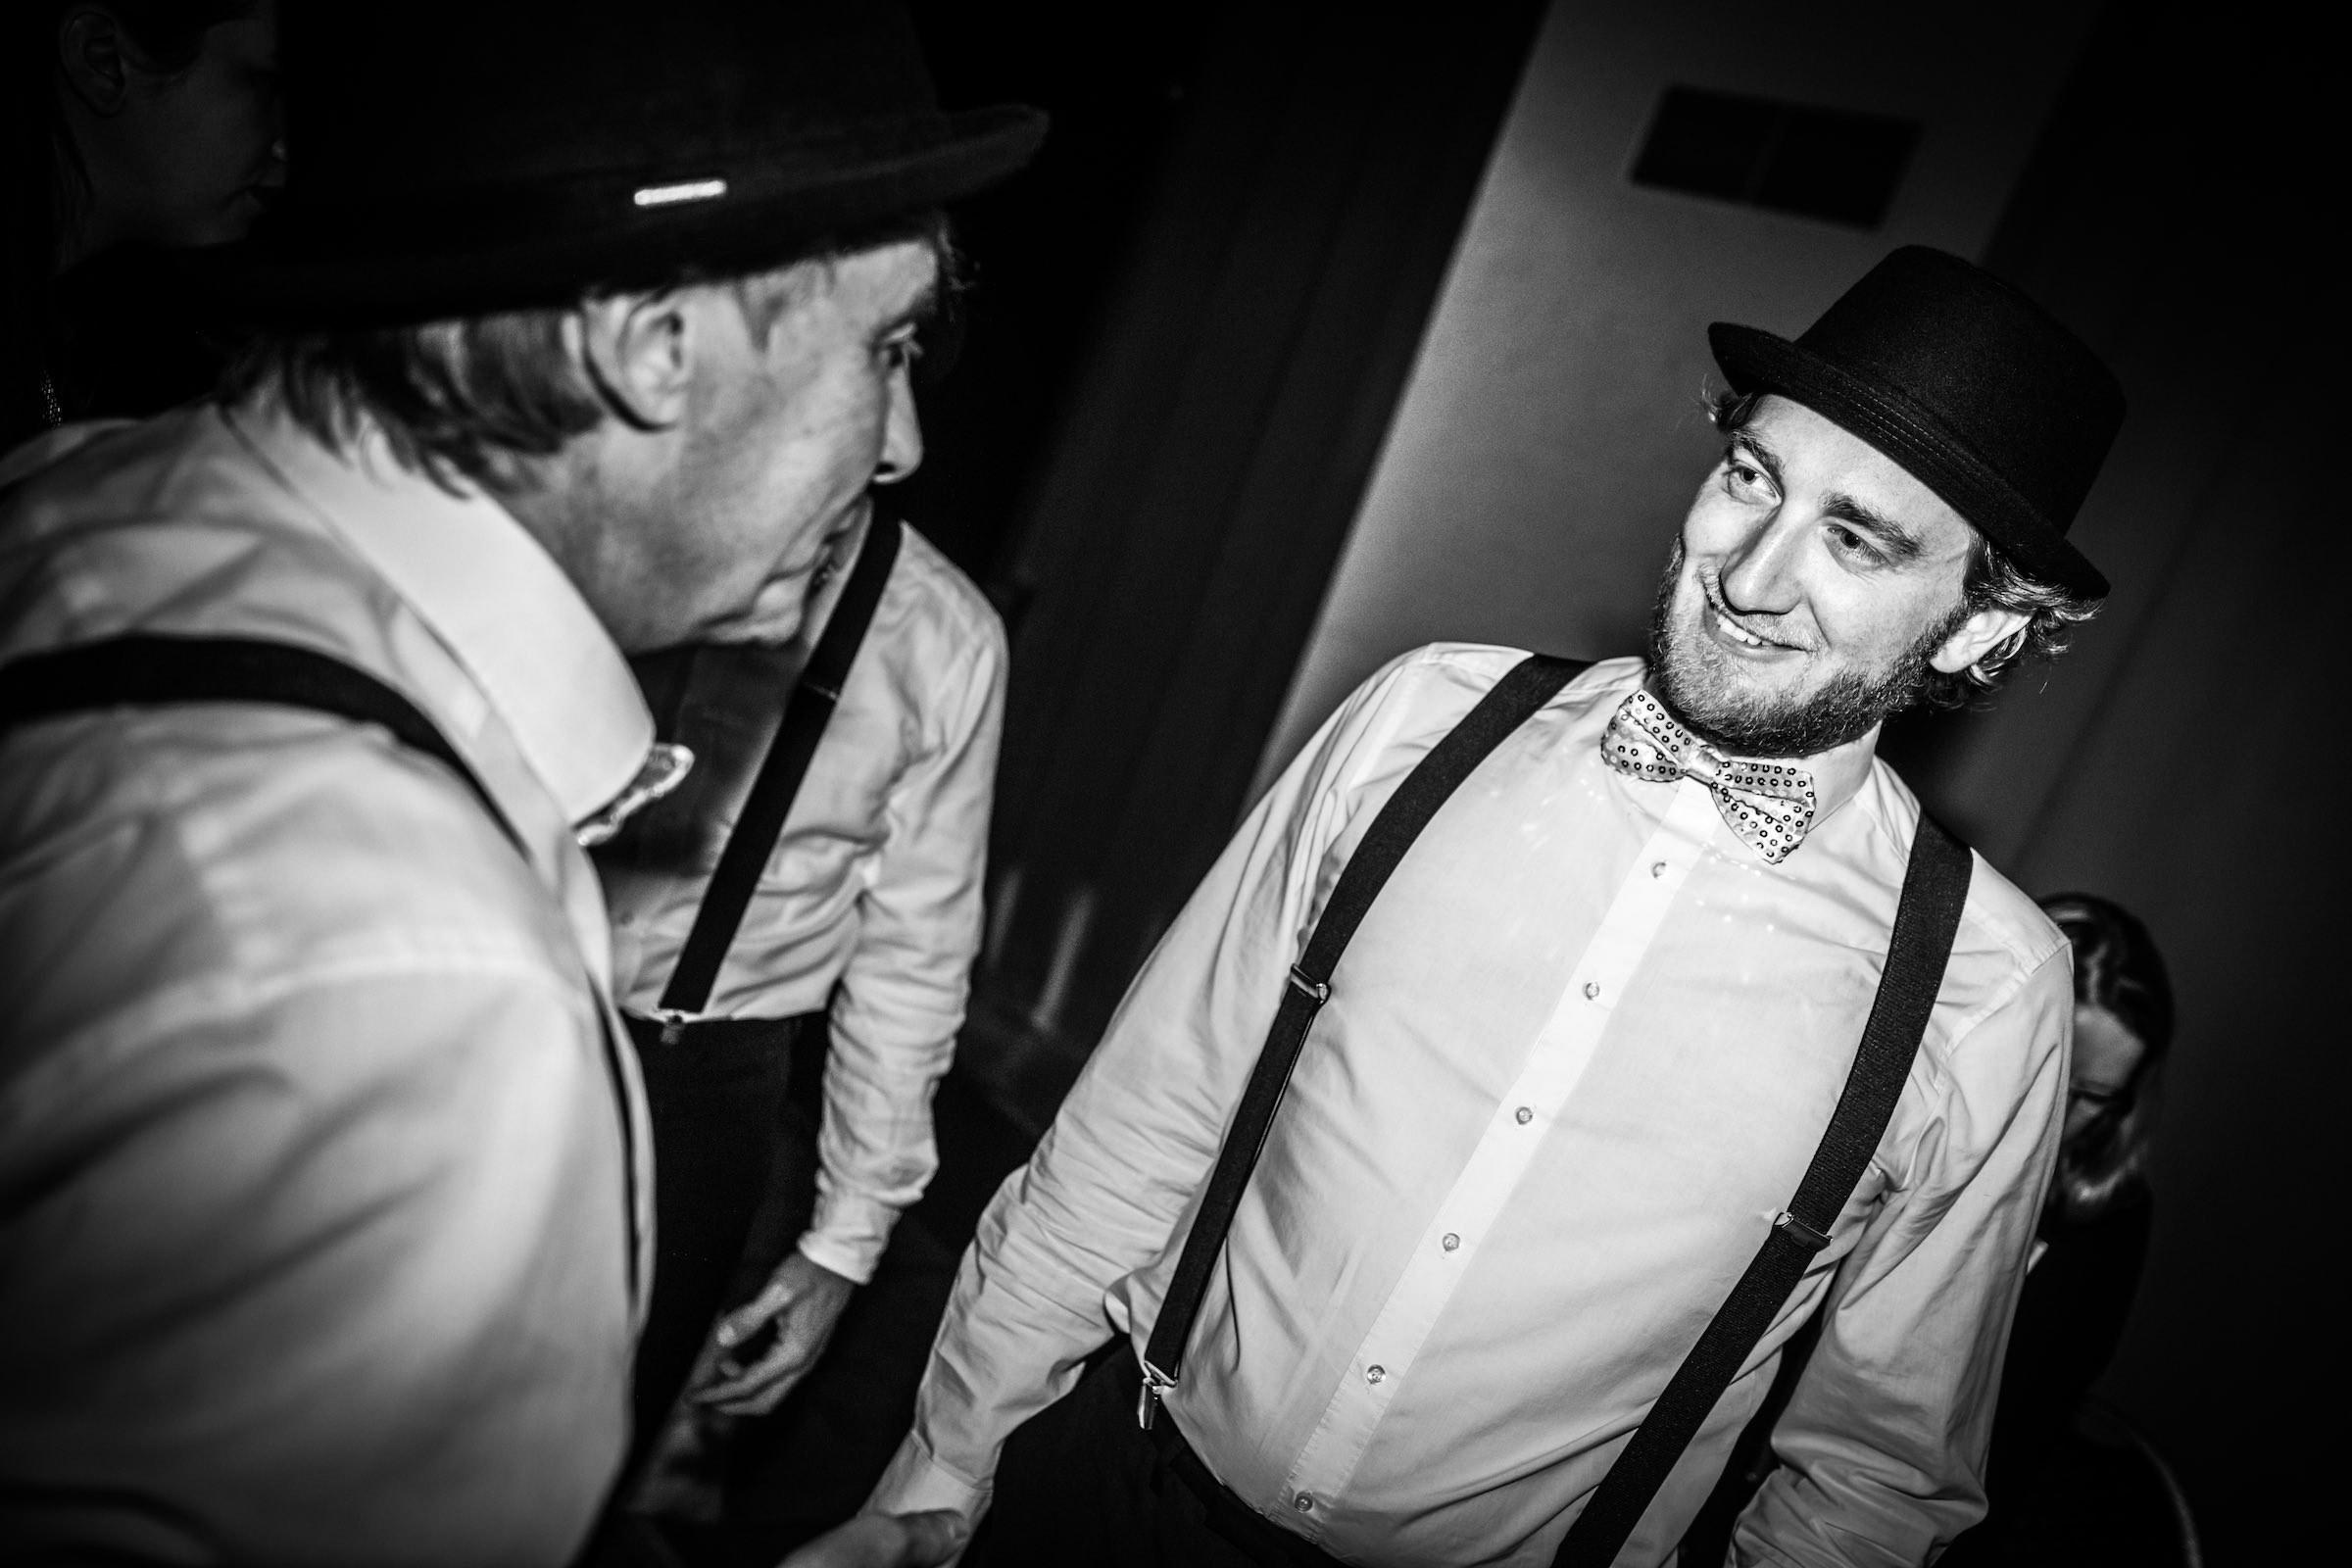 Band | Hannover | Liveband | Partyband | Jazzband | Swingband | Loungeband | Popband | Jazz | Motwon | Absprache | Kundentermin | Hochzeit | Messe | Firmenfeier | Charity | Gala | Buchen | Lehmann | Eventservice